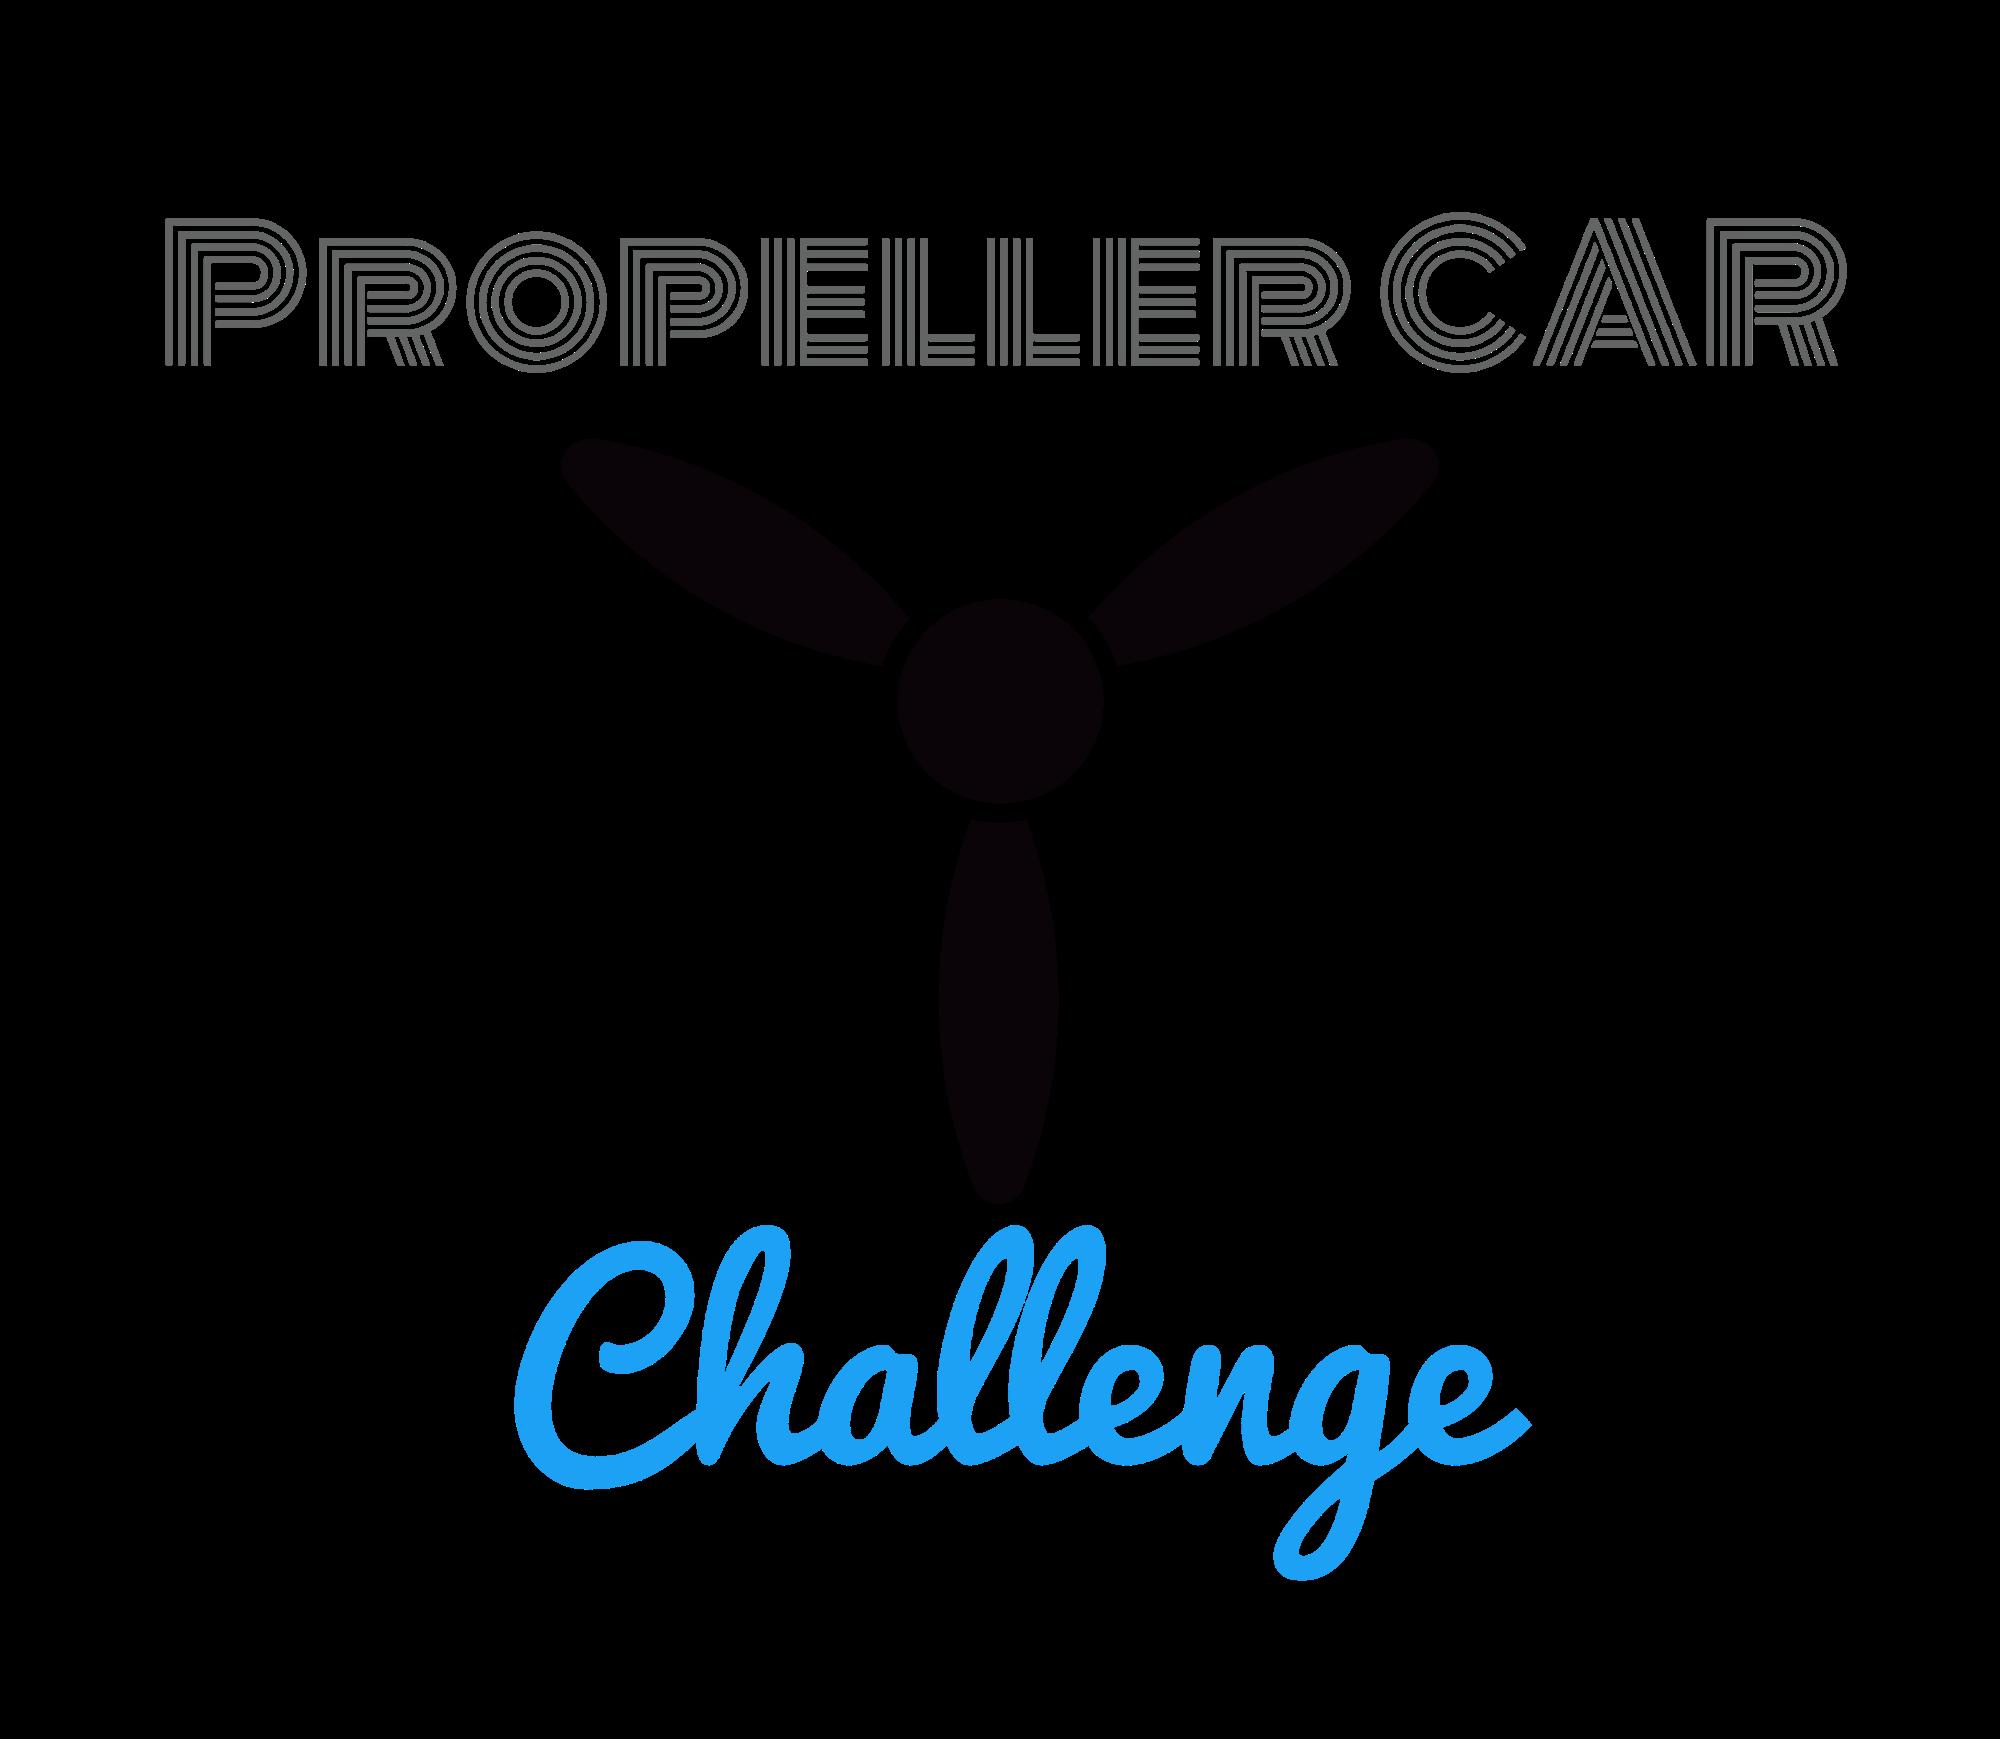 Propeller Car Challenge